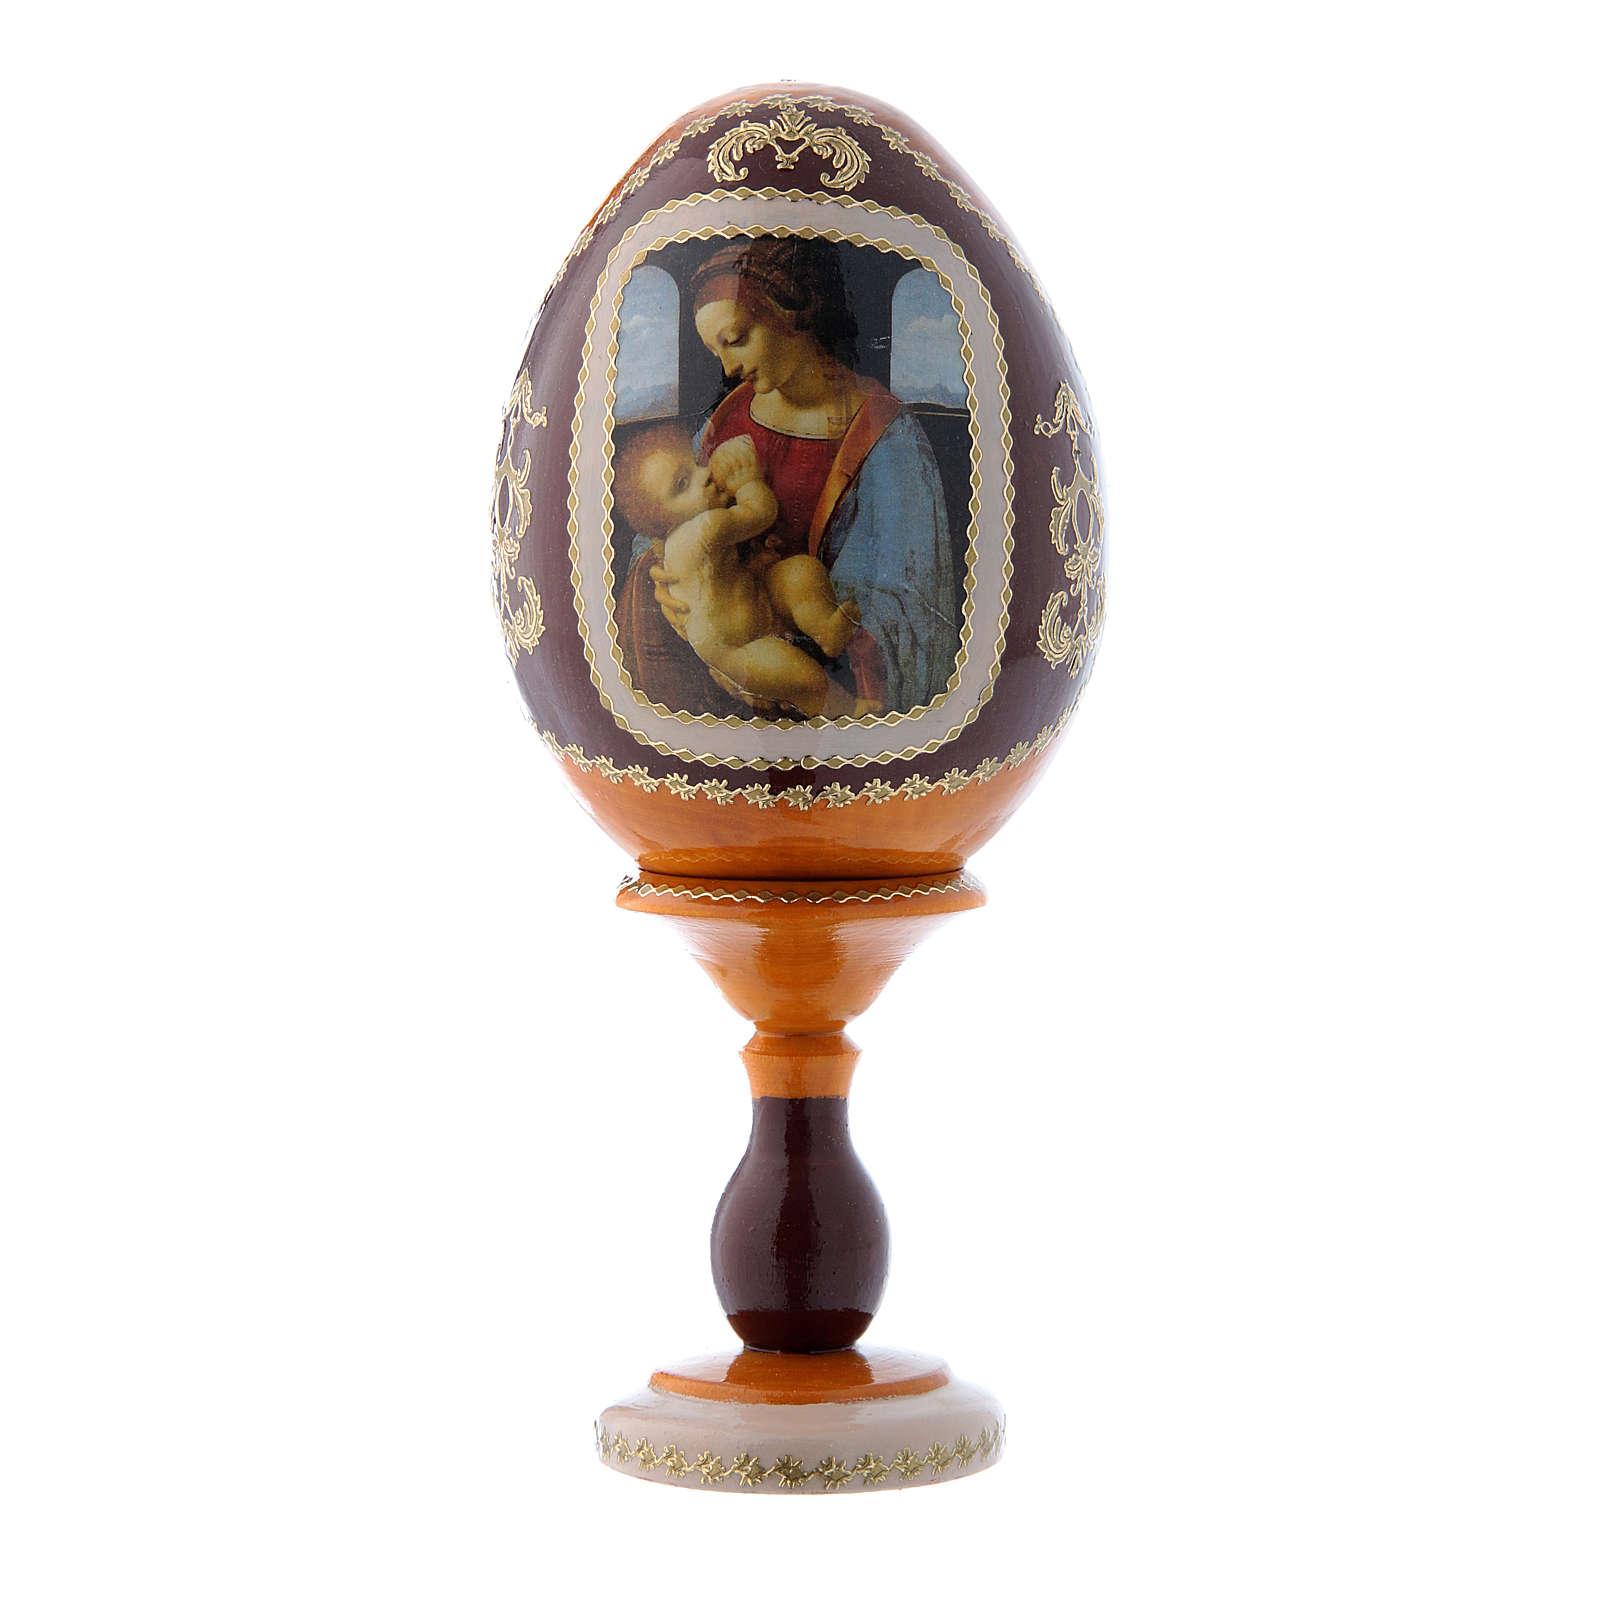 Oeuf russe La Madone Litta jaune en bois h tot 16 cm 4